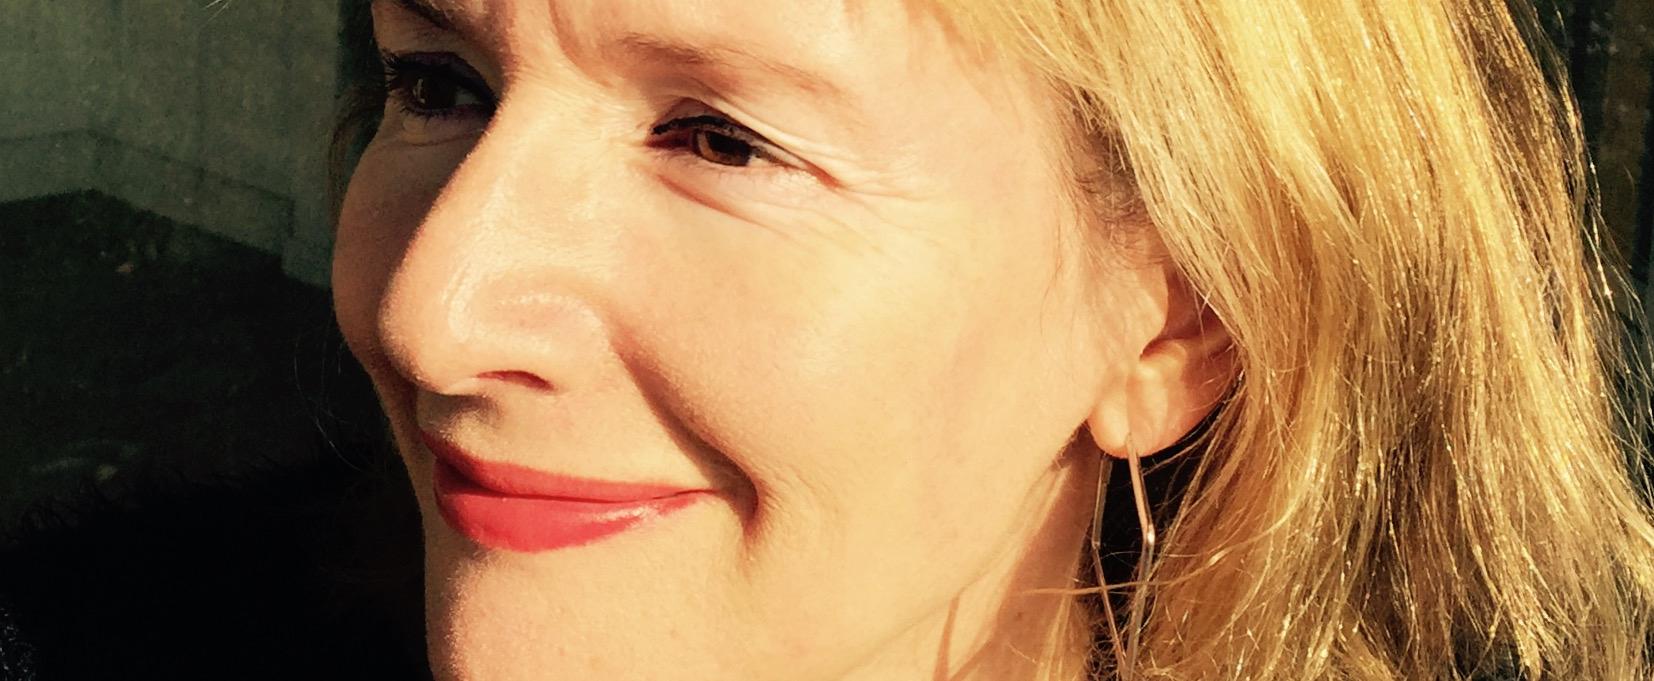 Vanessa Norwood on Boundaries